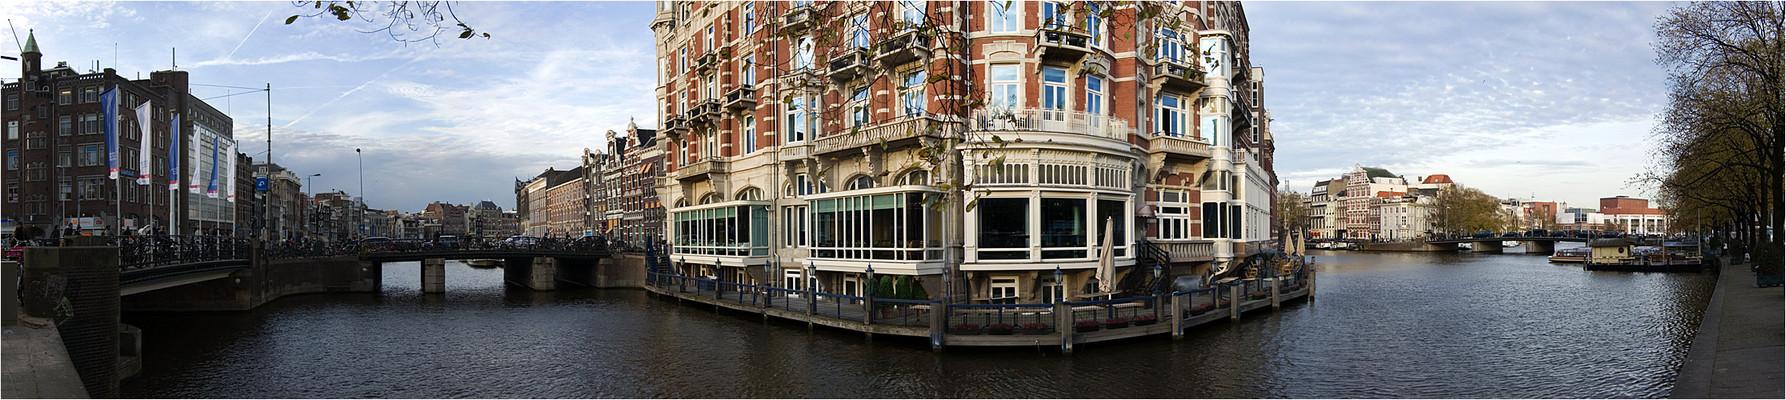 Amsterdam 11 04